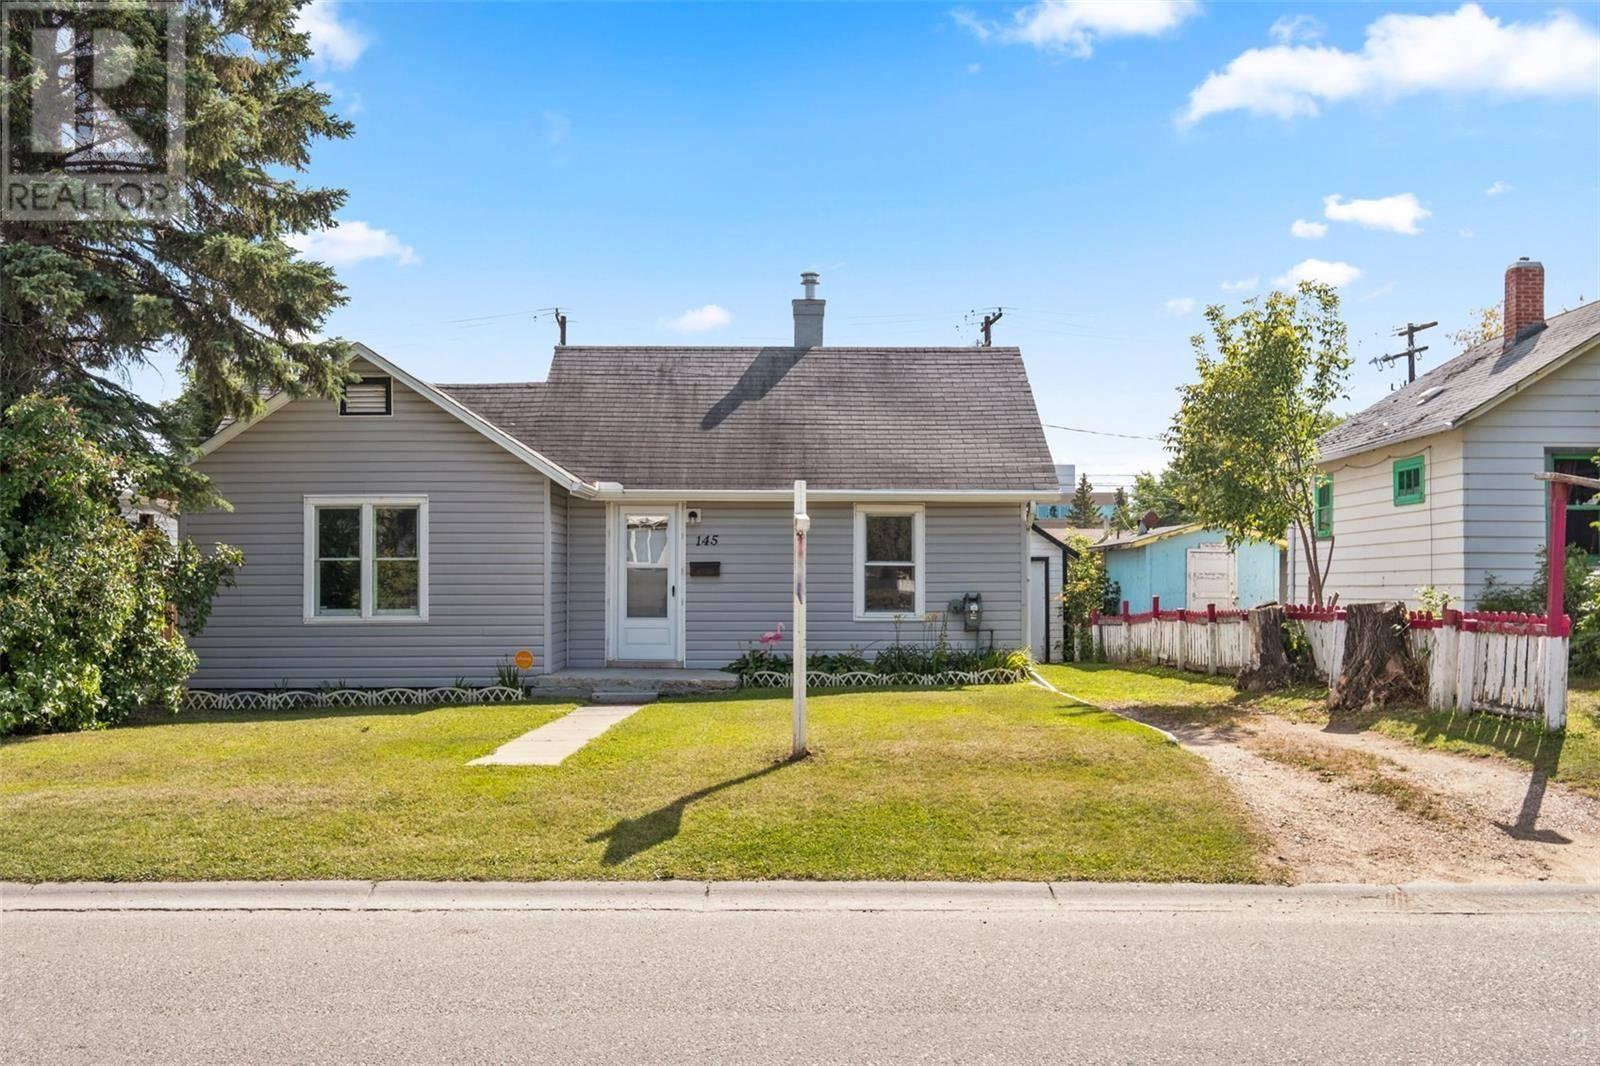 House for sale at 145 26th St W Prince Albert Saskatchewan - MLS: SK784810